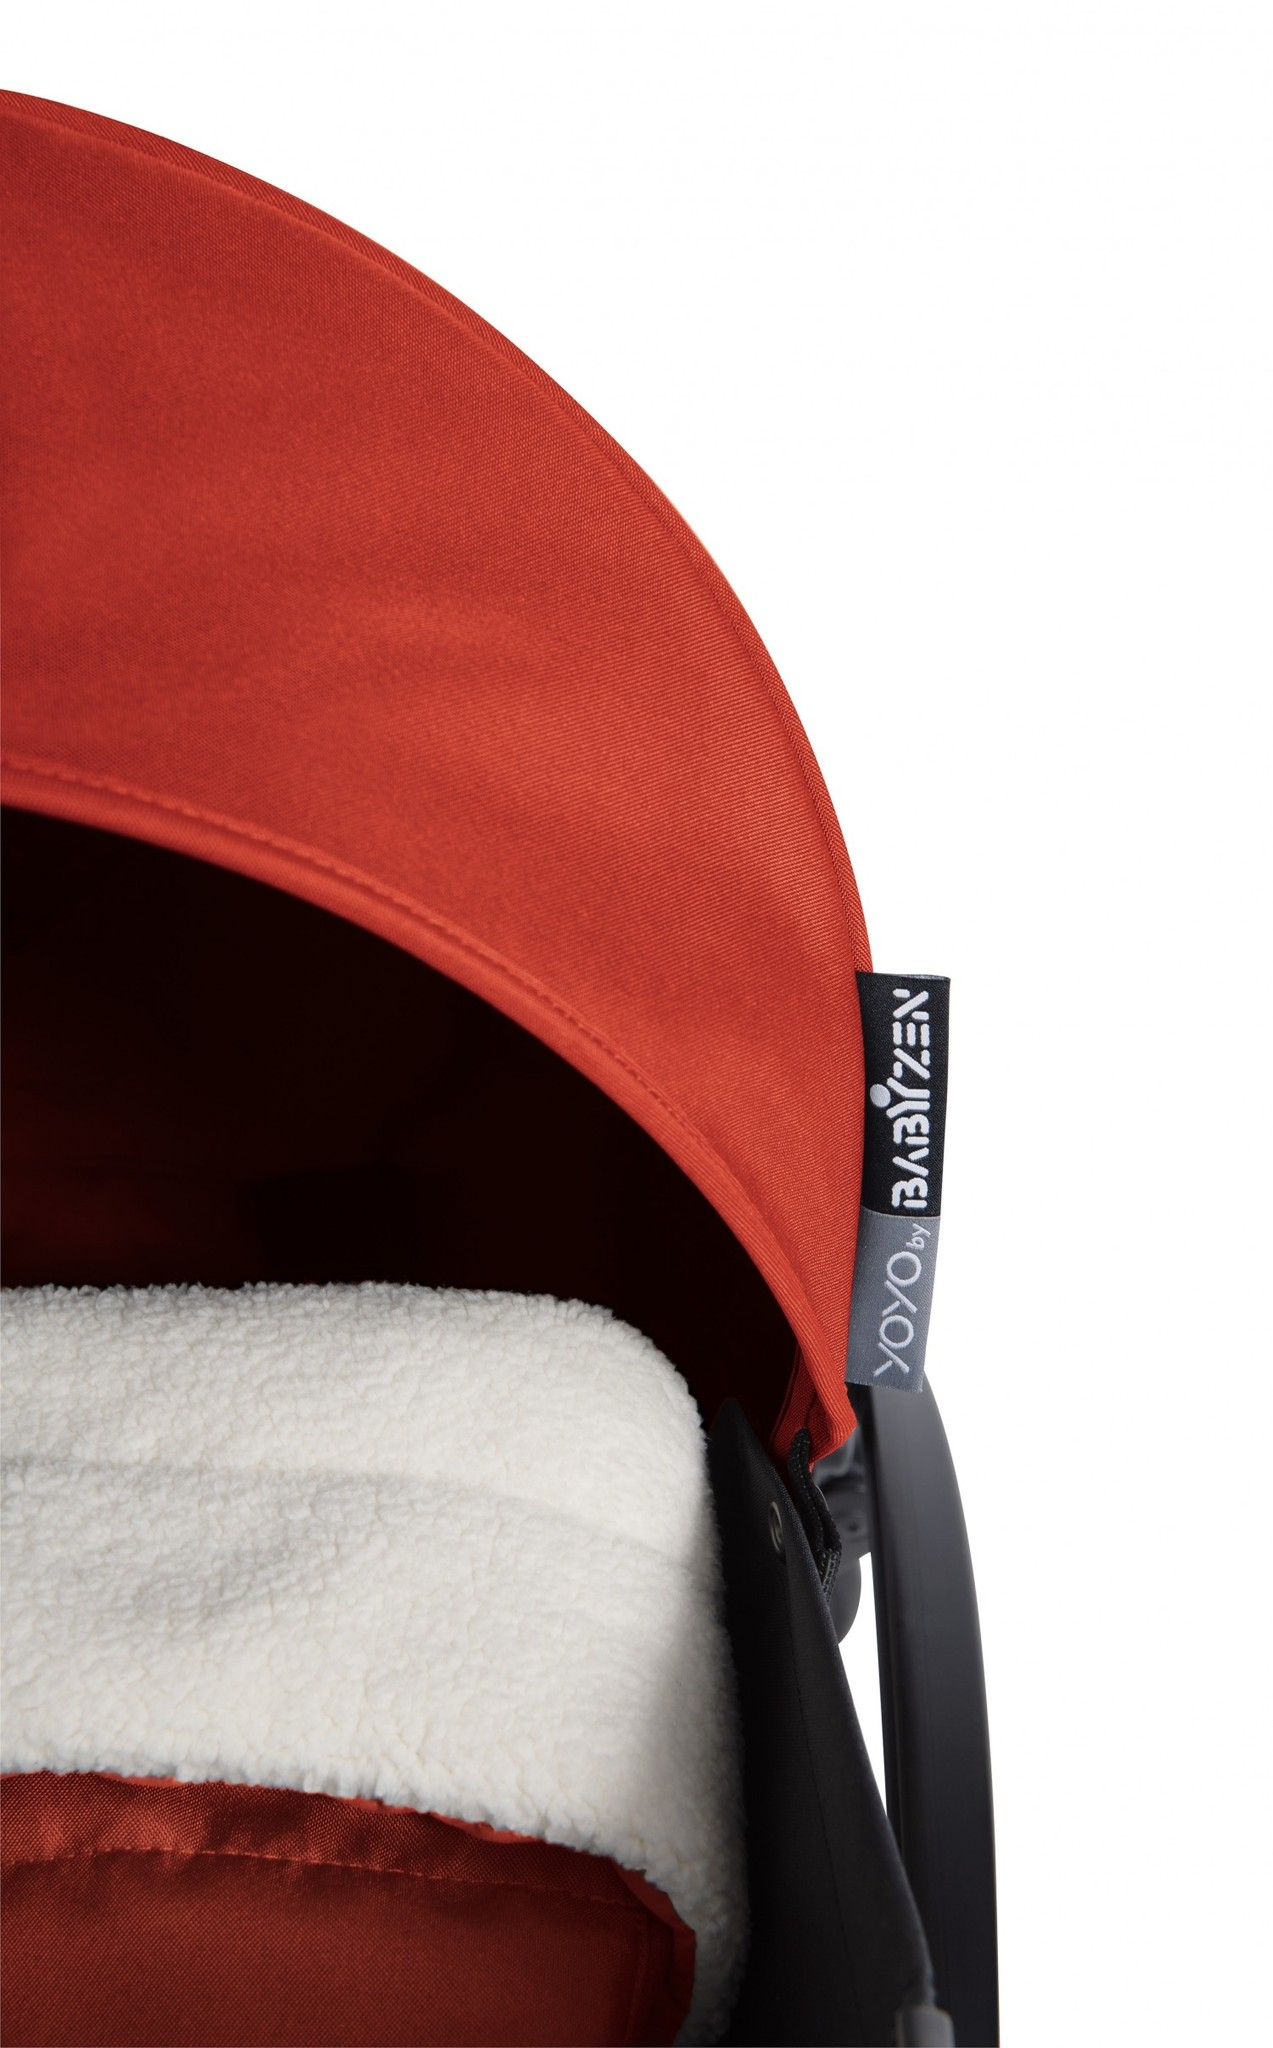 Babyzen Babyzen Yoyo 0+ Newborn Pack - Red 2020